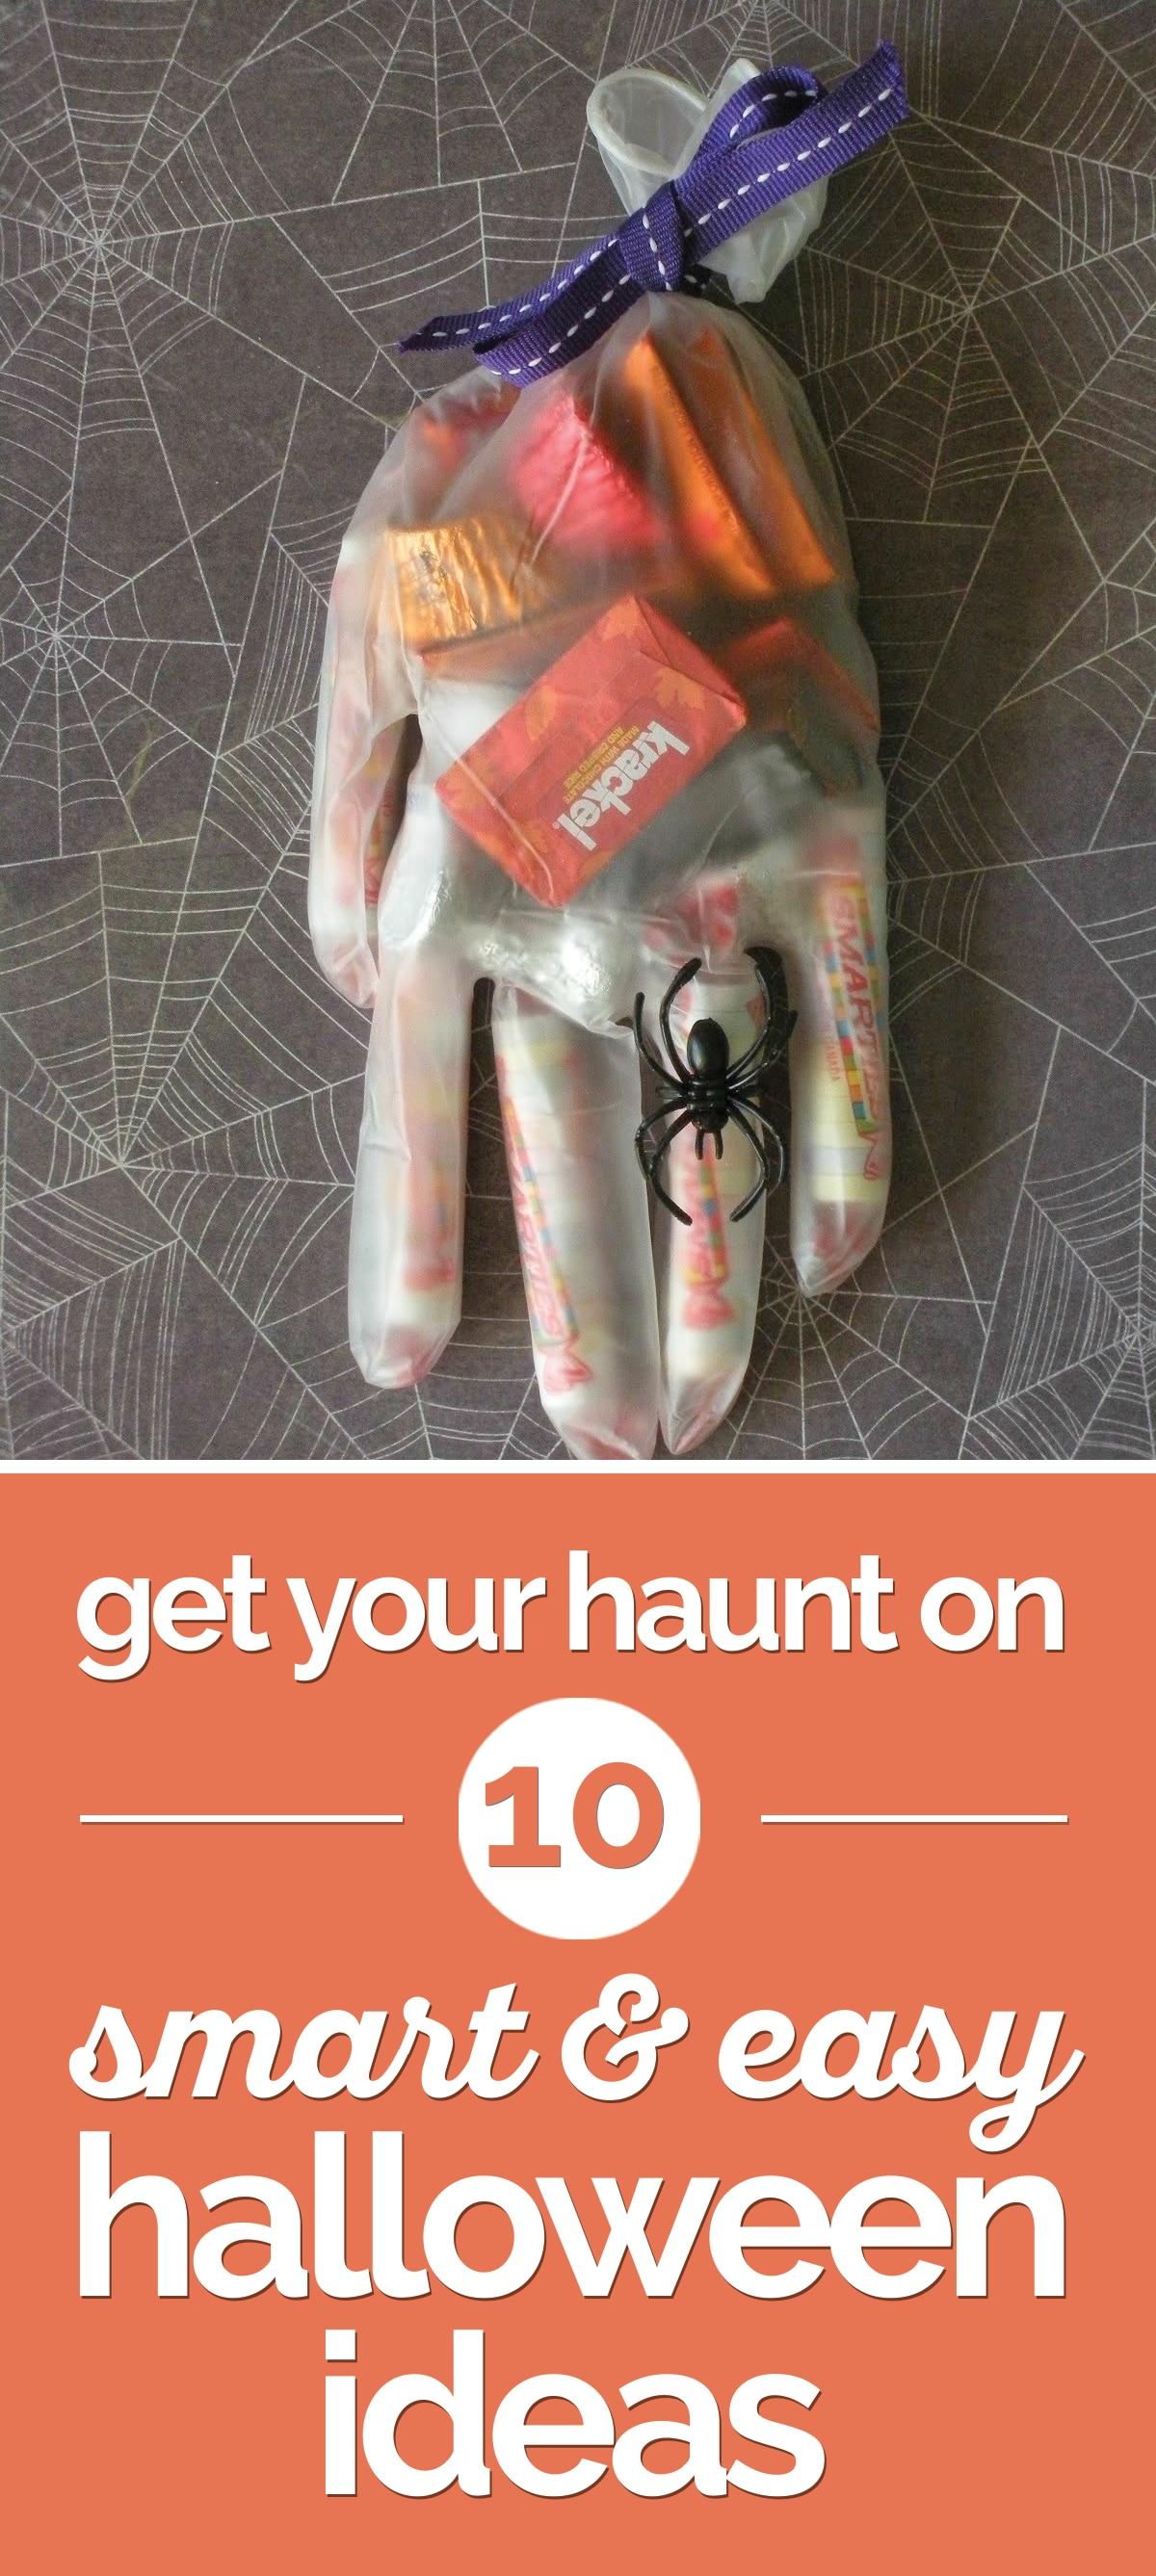 Get Your Haunt On: 10 Smart & Easy Halloween Ideas | the good stuff